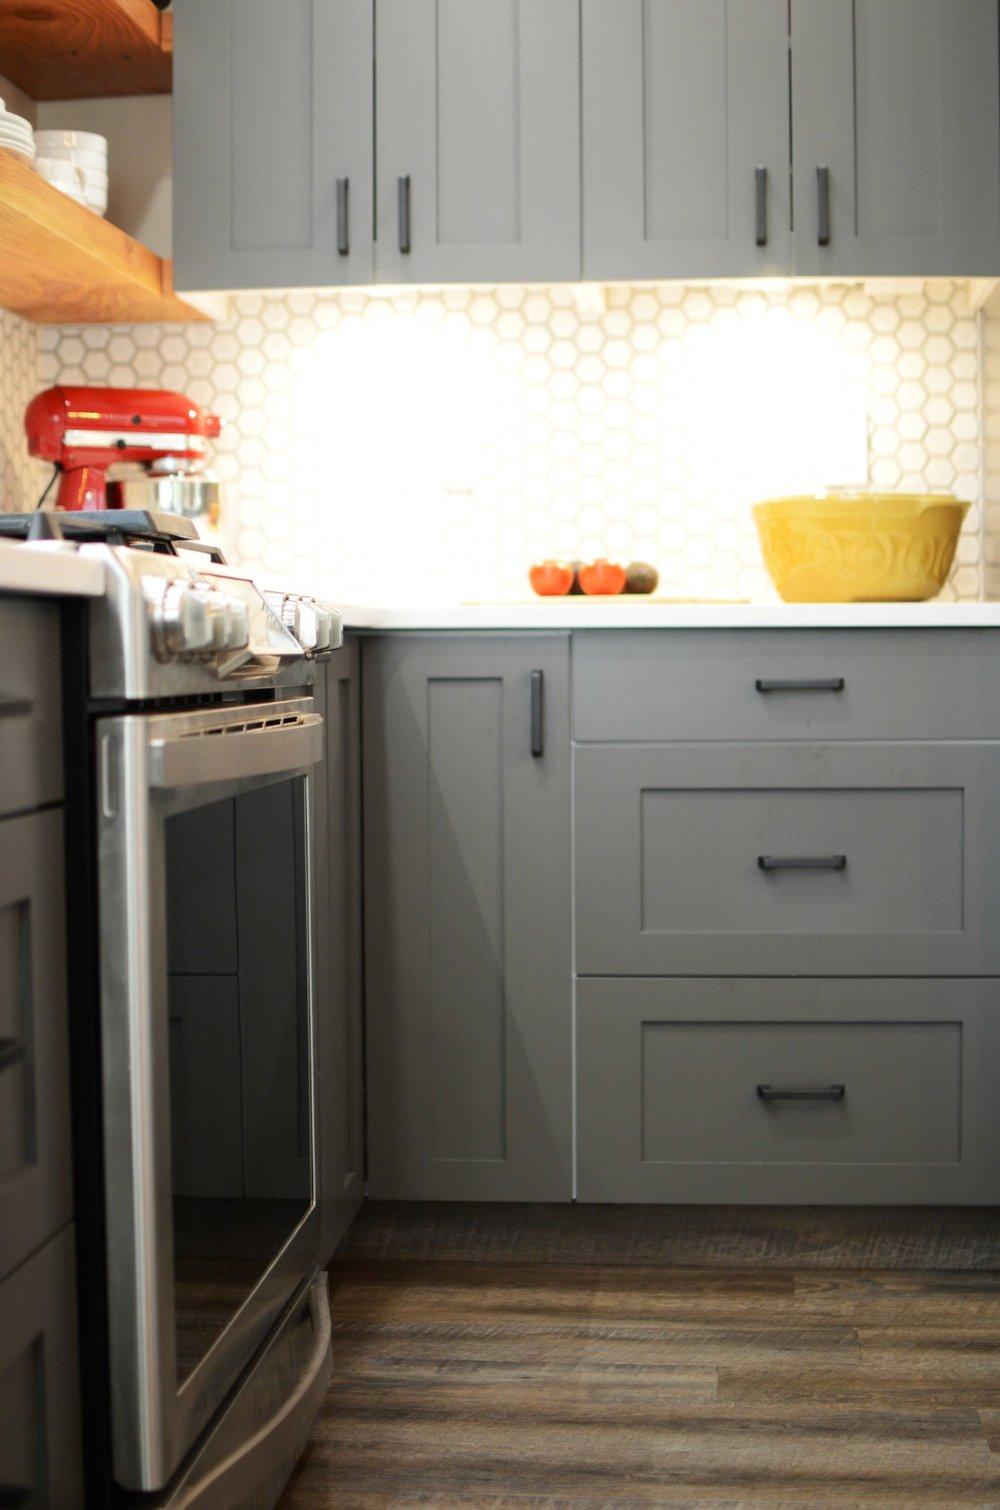 calgary-interior-design-kitchen-renovation-modern-farmhouse-9.jpg